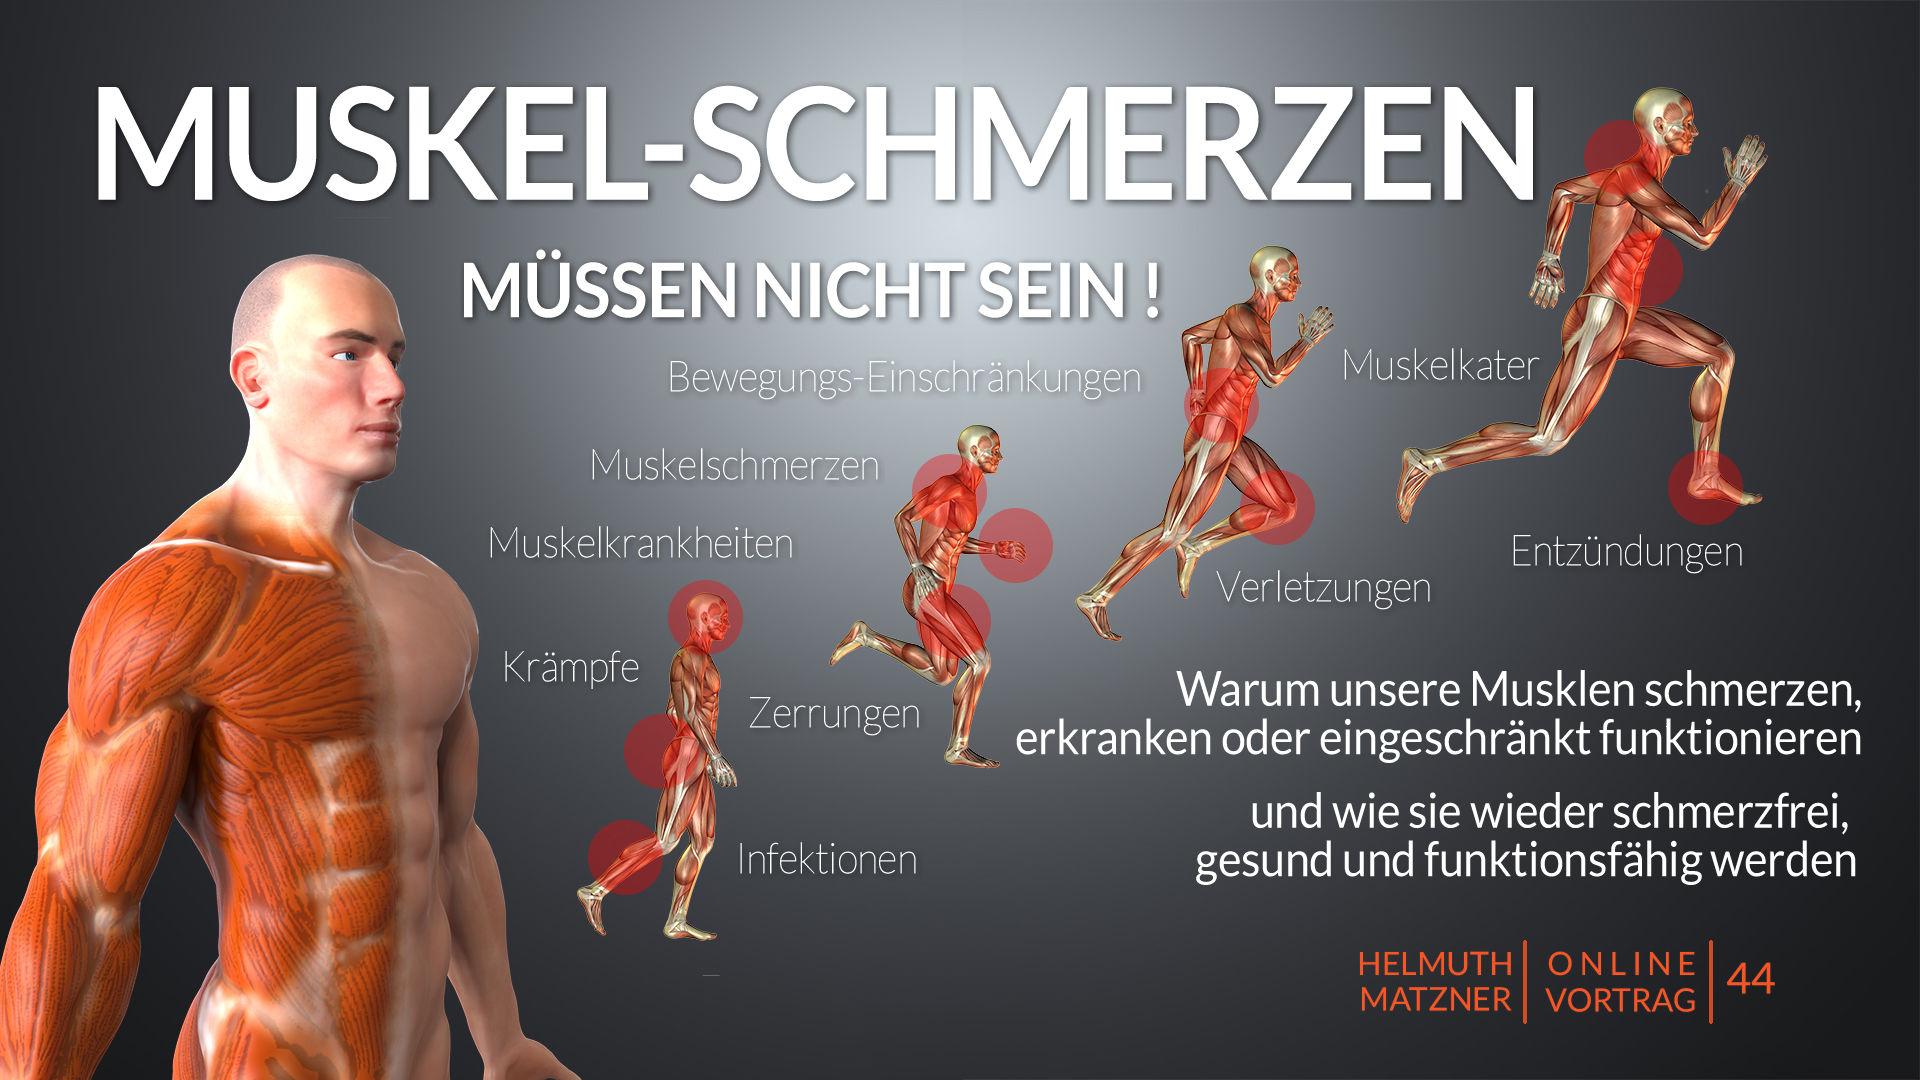 Helmuth Matzner - Online-Vortrag 44 - Muskeln - Archiv v07